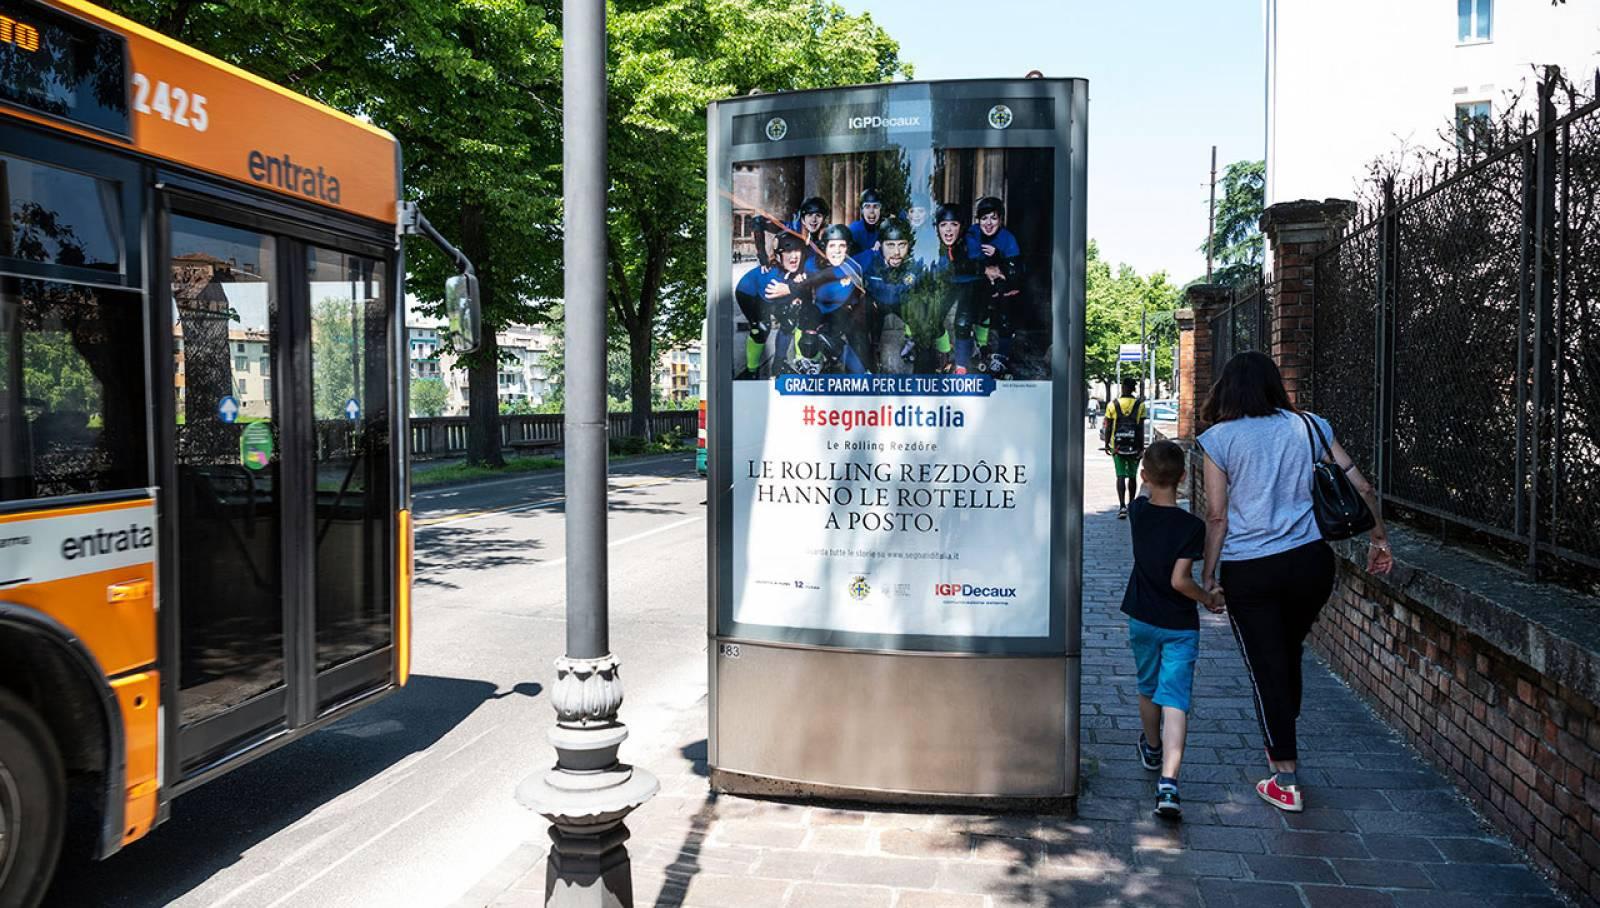 Pubblicità OOH IGPdecaux mupi a Parma per Segnali d'Italia